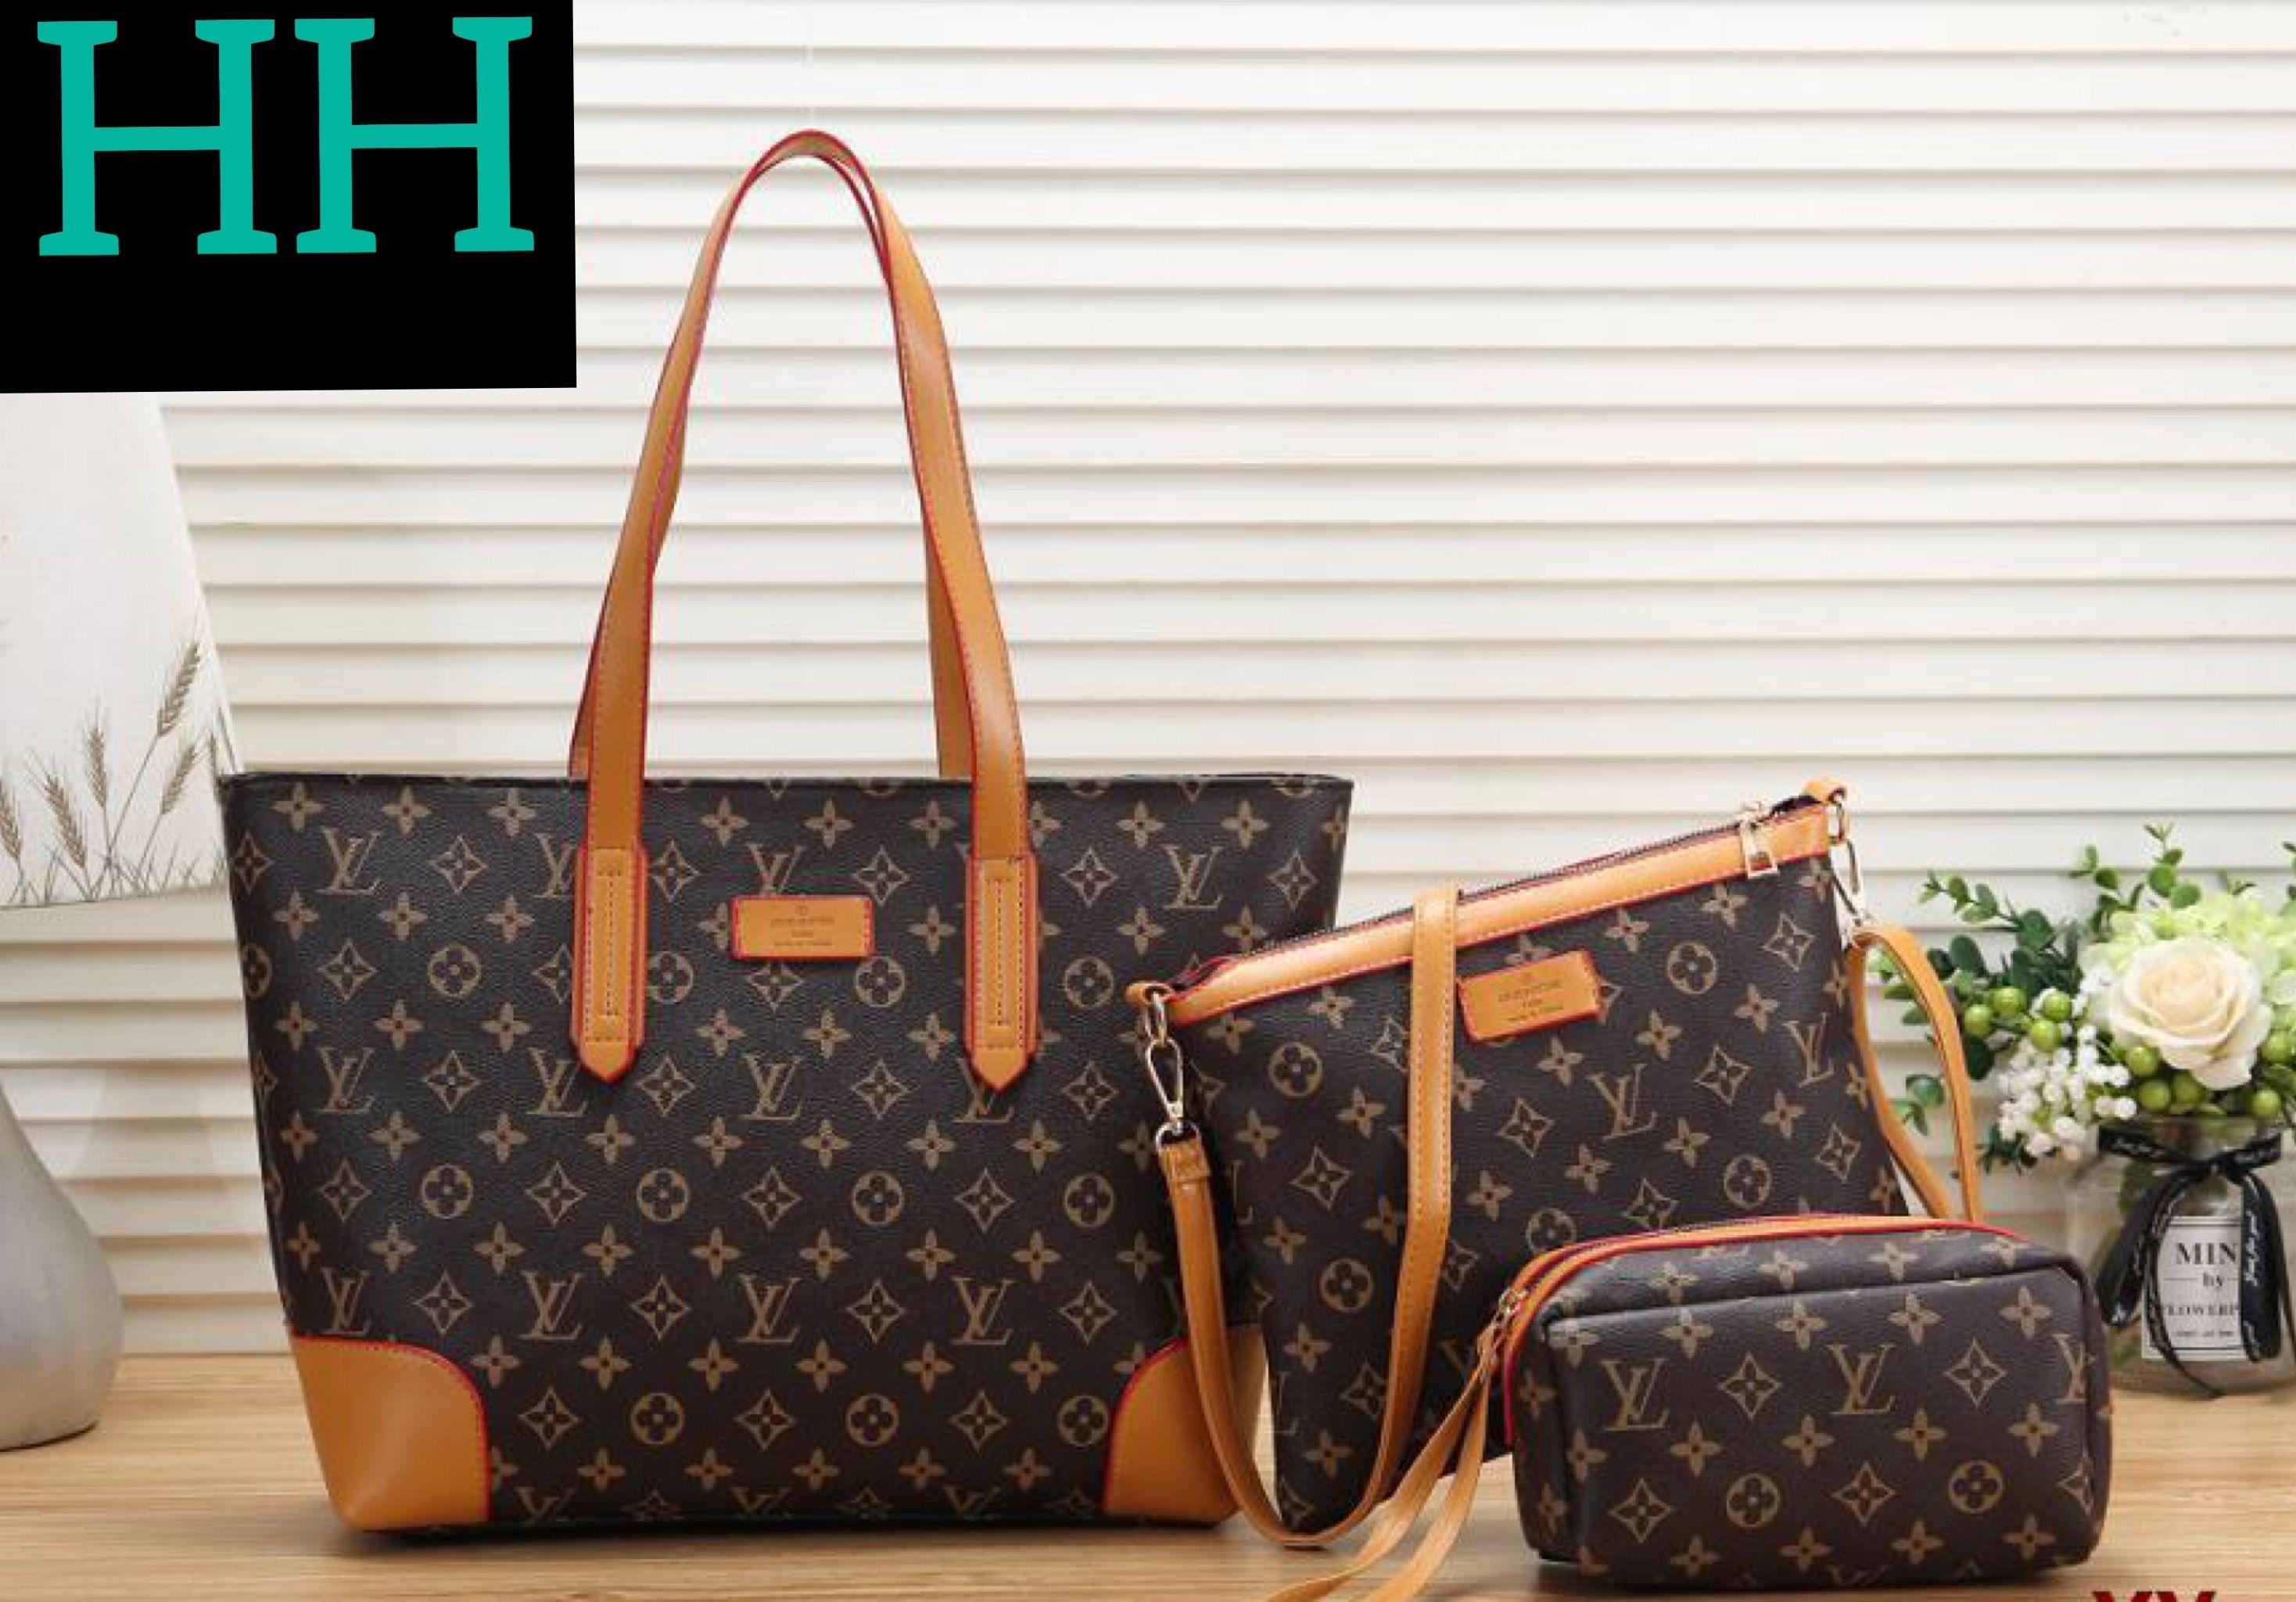 Double H Designer LV Handbag Set in 2020 | Lv handbags, Bags